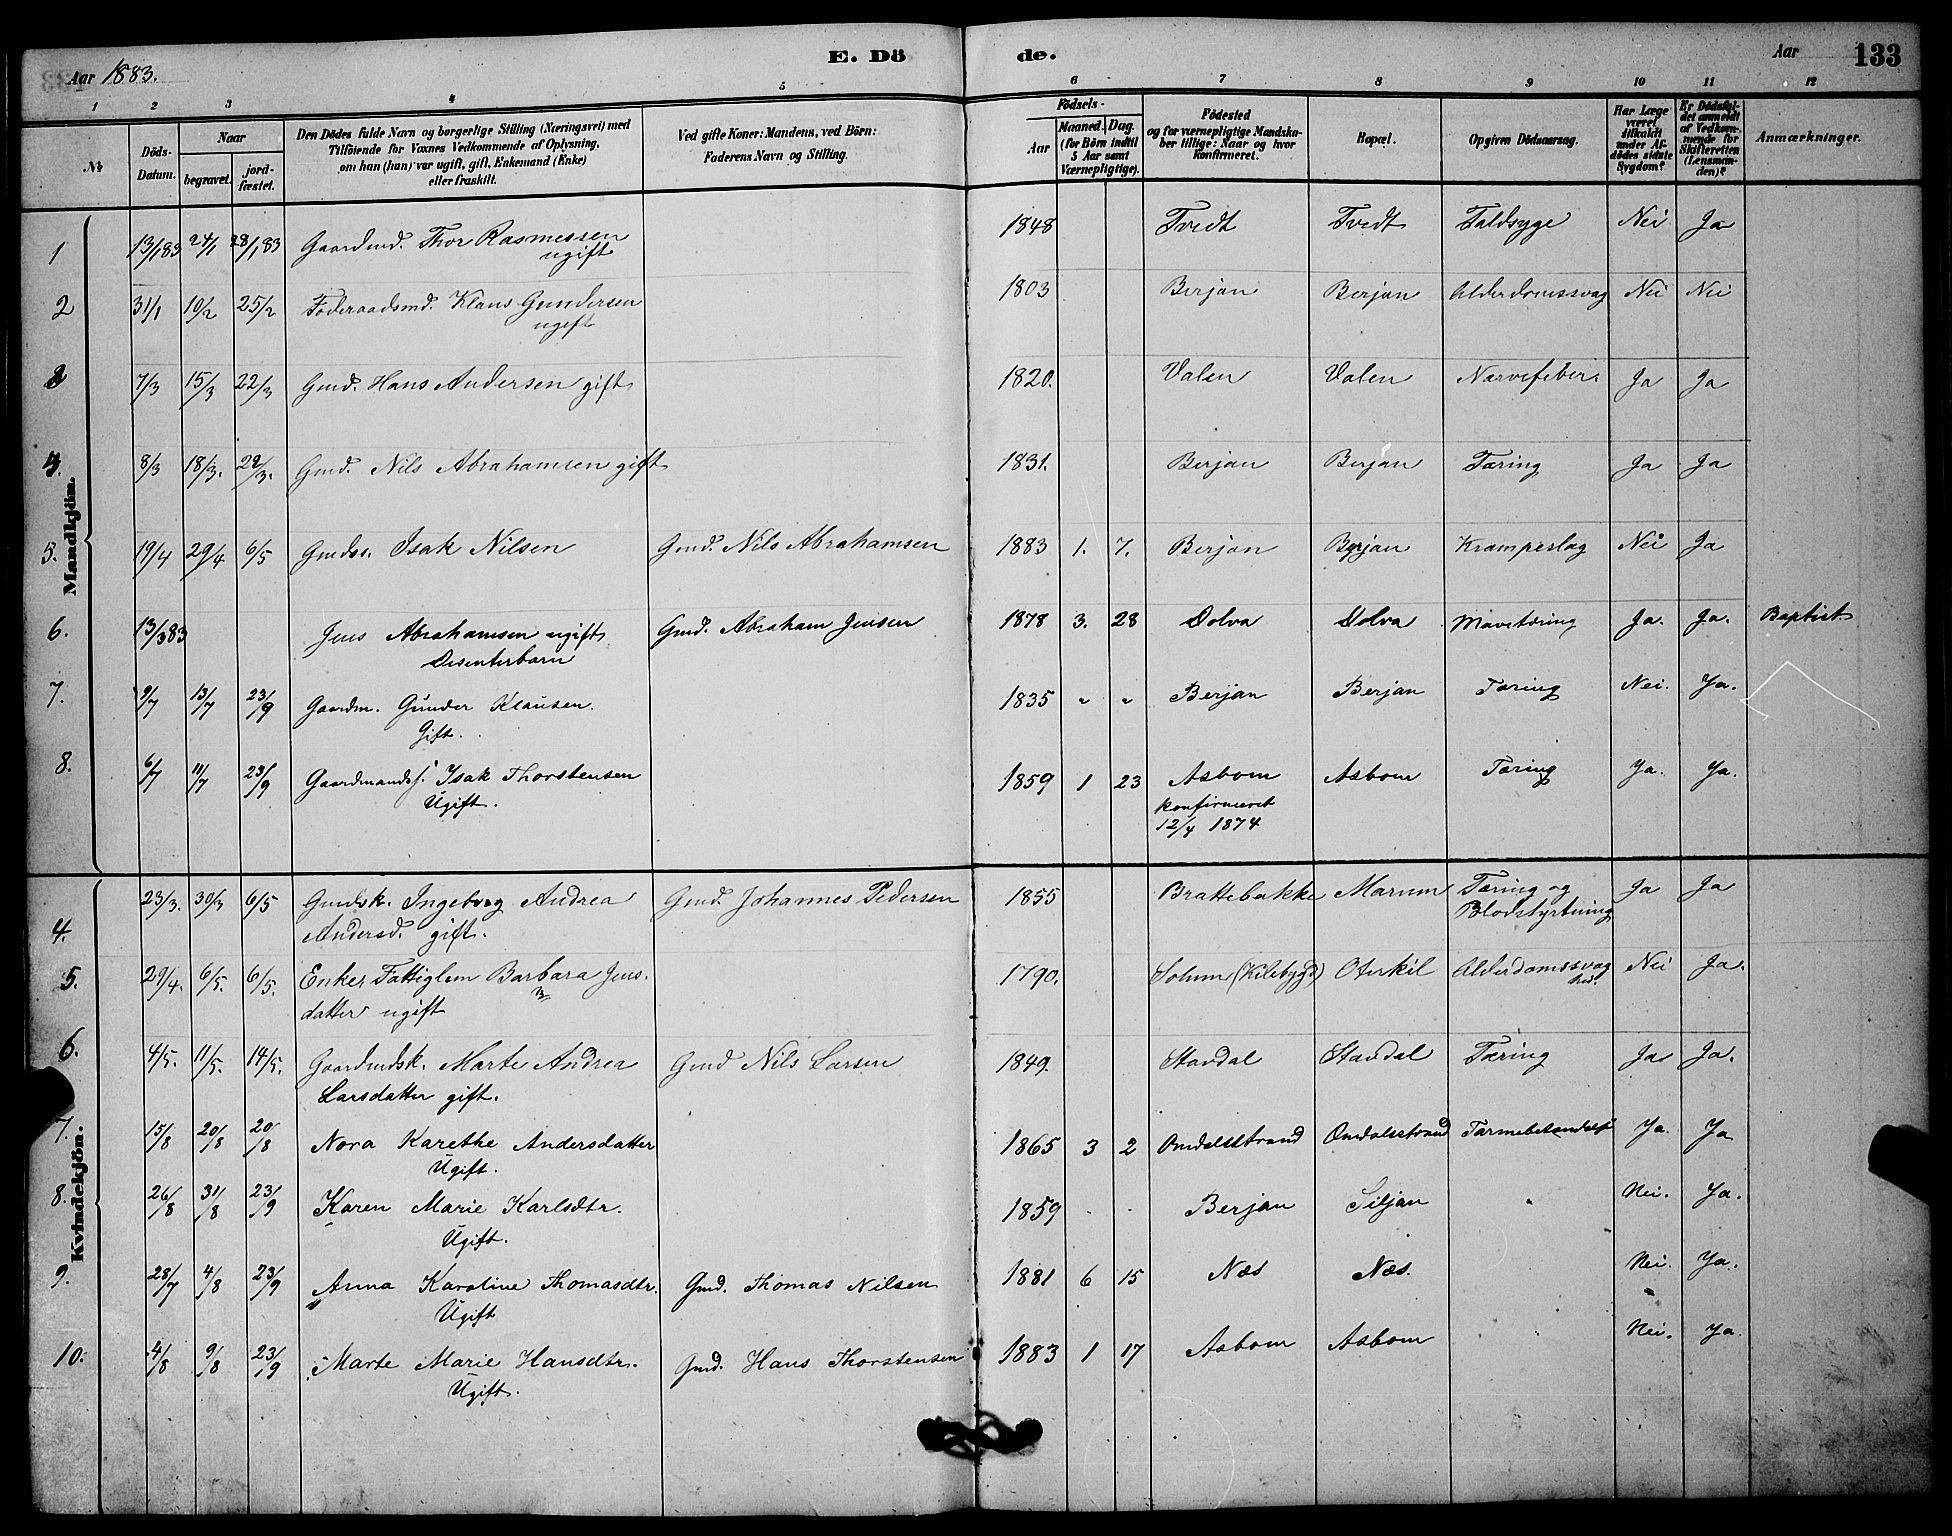 SAKO, Solum kirkebøker, G/Gb/L0003: Klokkerbok nr. II 3, 1880-1898, s. 133